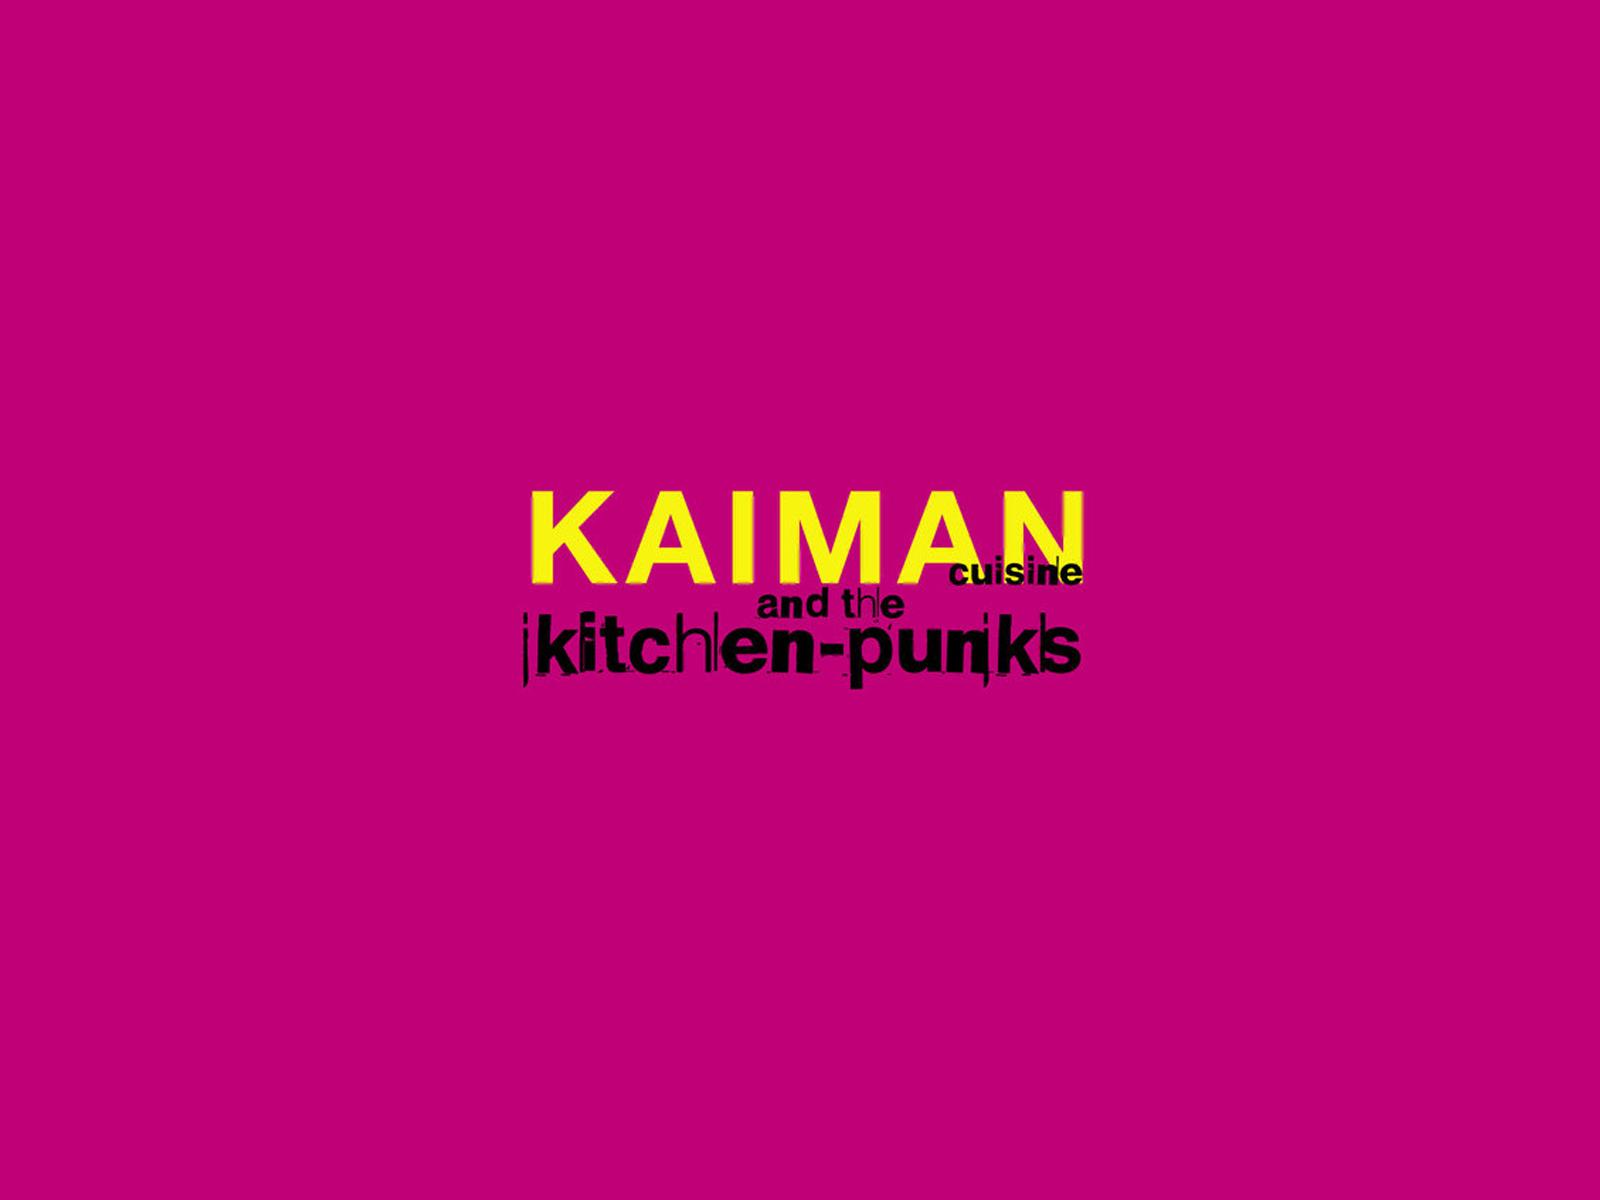 Kaiman cuisine kitchenpunks Logo